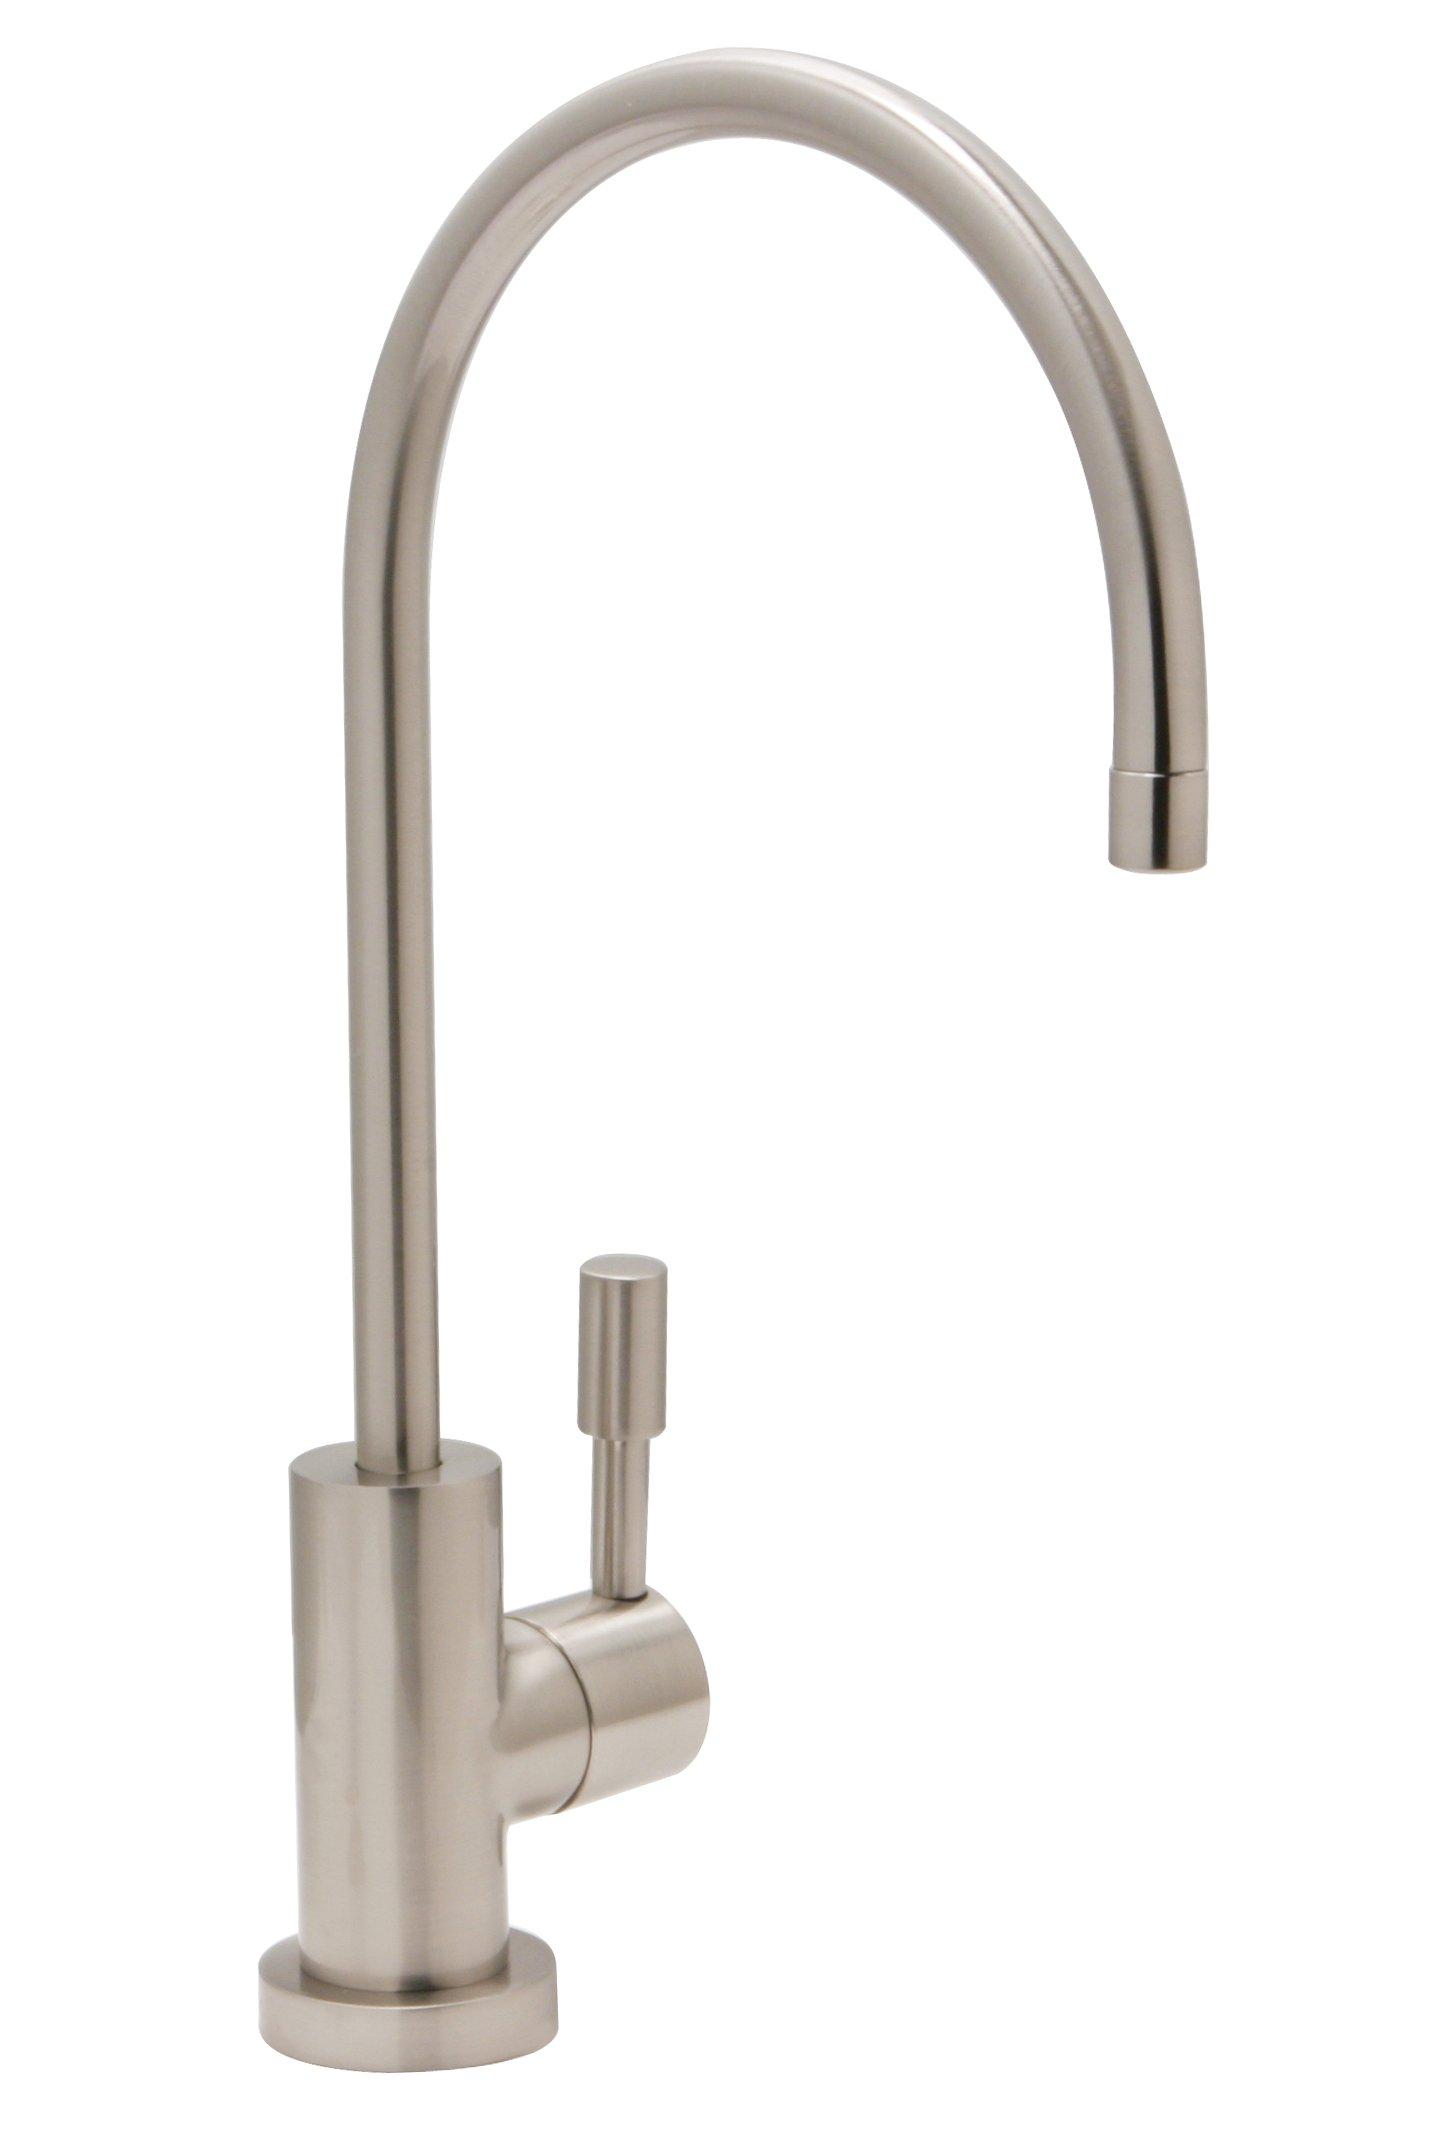 Huntington Brass 41990-12 Modern Drinking Water Filtration Faucet, Satin Nickel